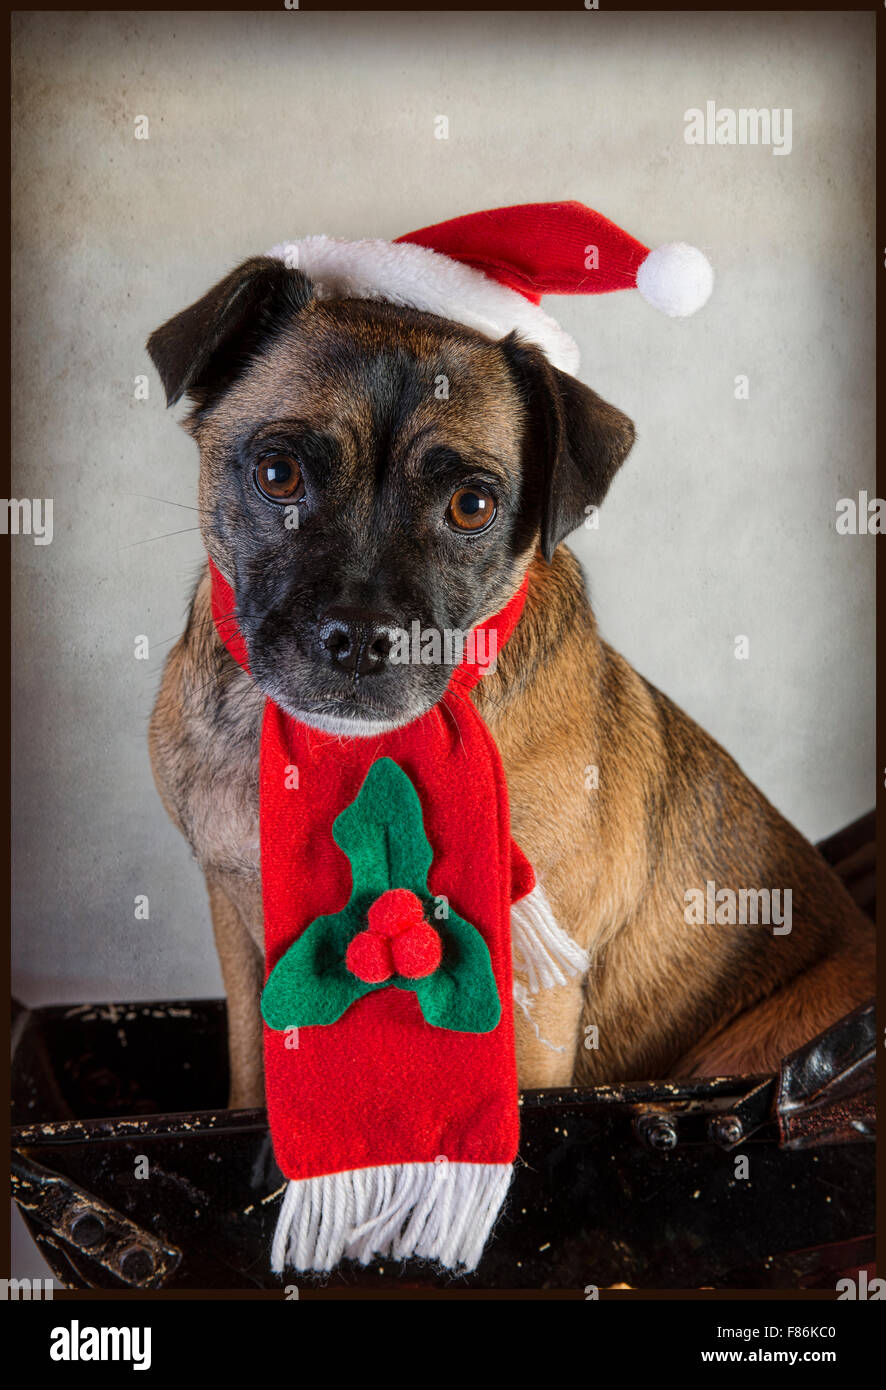 Cute Pug cross dog in Santa hat and scarf Stock Photo  91116032 - Alamy 8fa9840518a